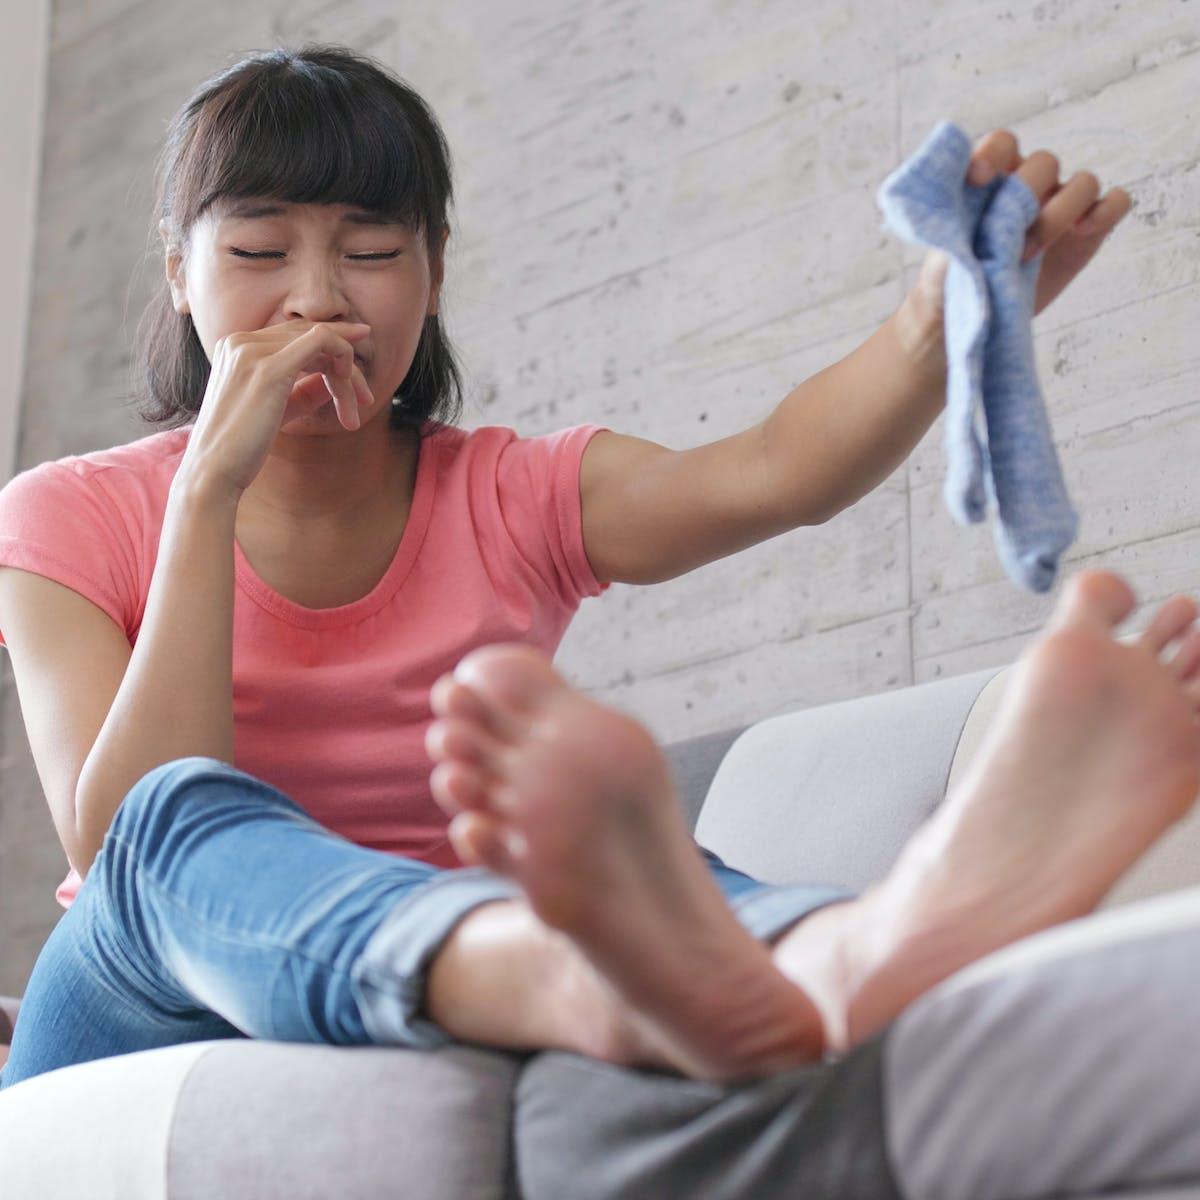 Lesbian Dirty Feet Cleaning